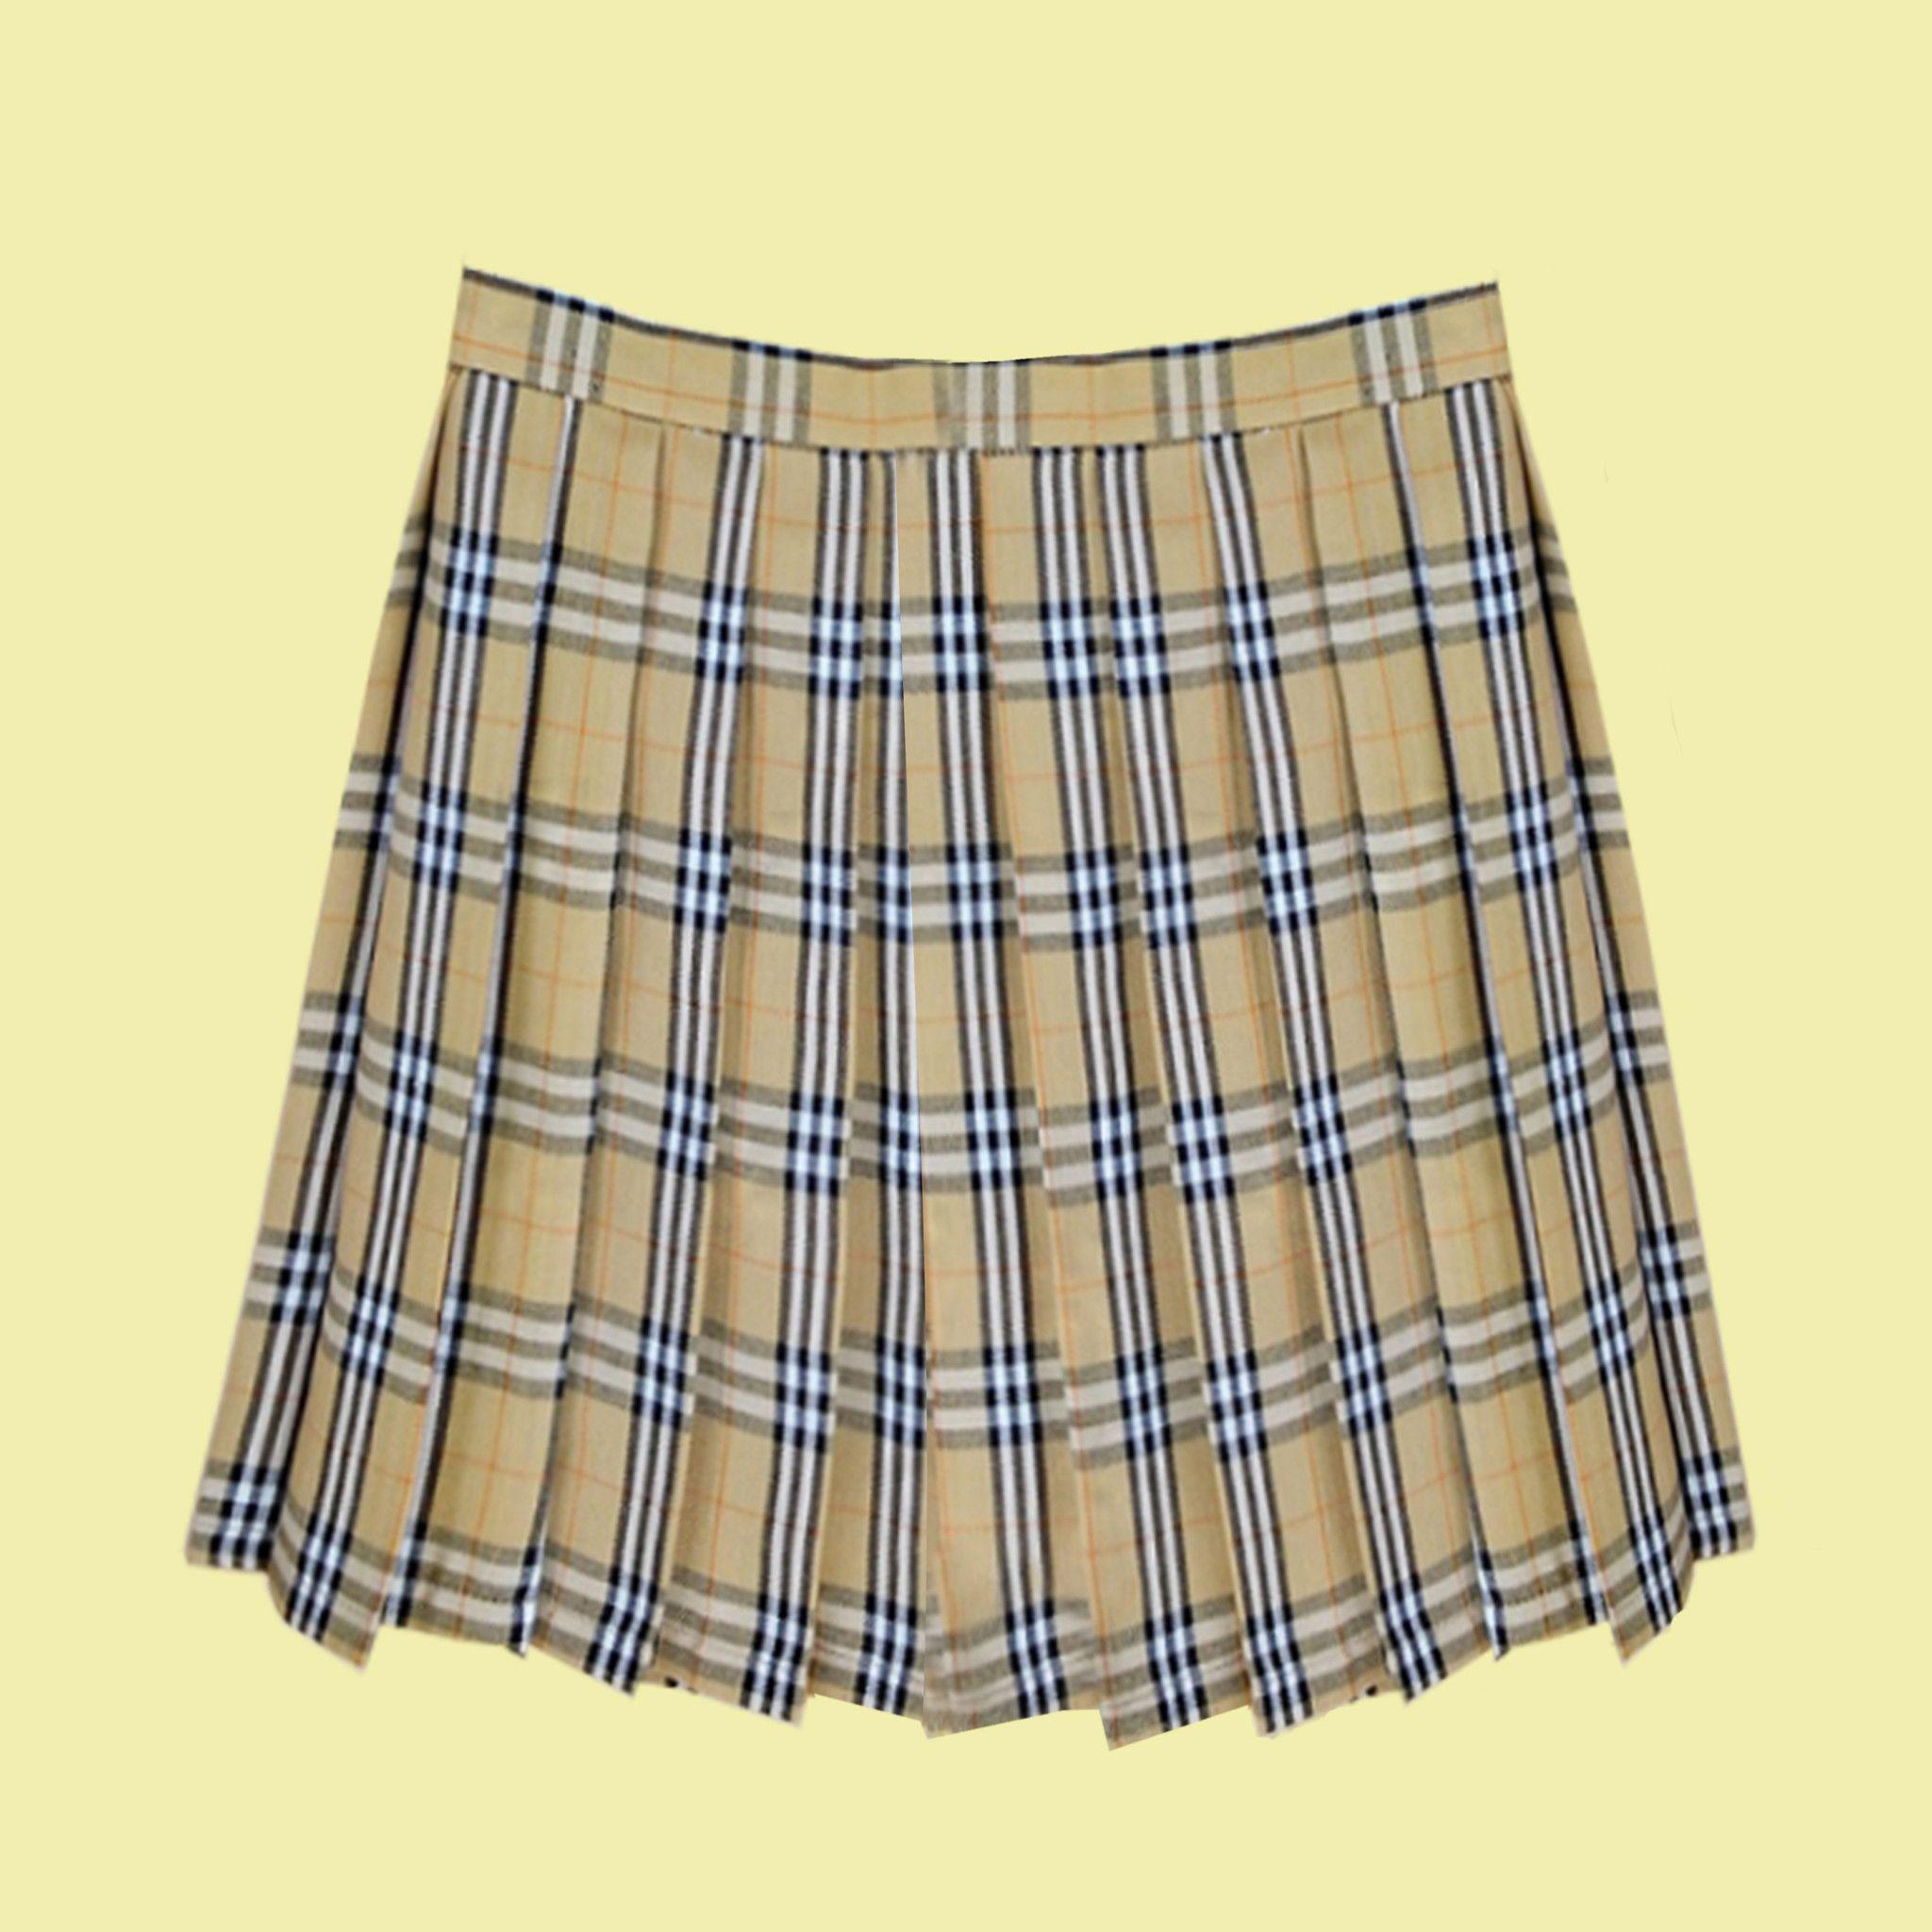 plaid tumblr pleated skirt -brown | clothes | pinterest | plaid